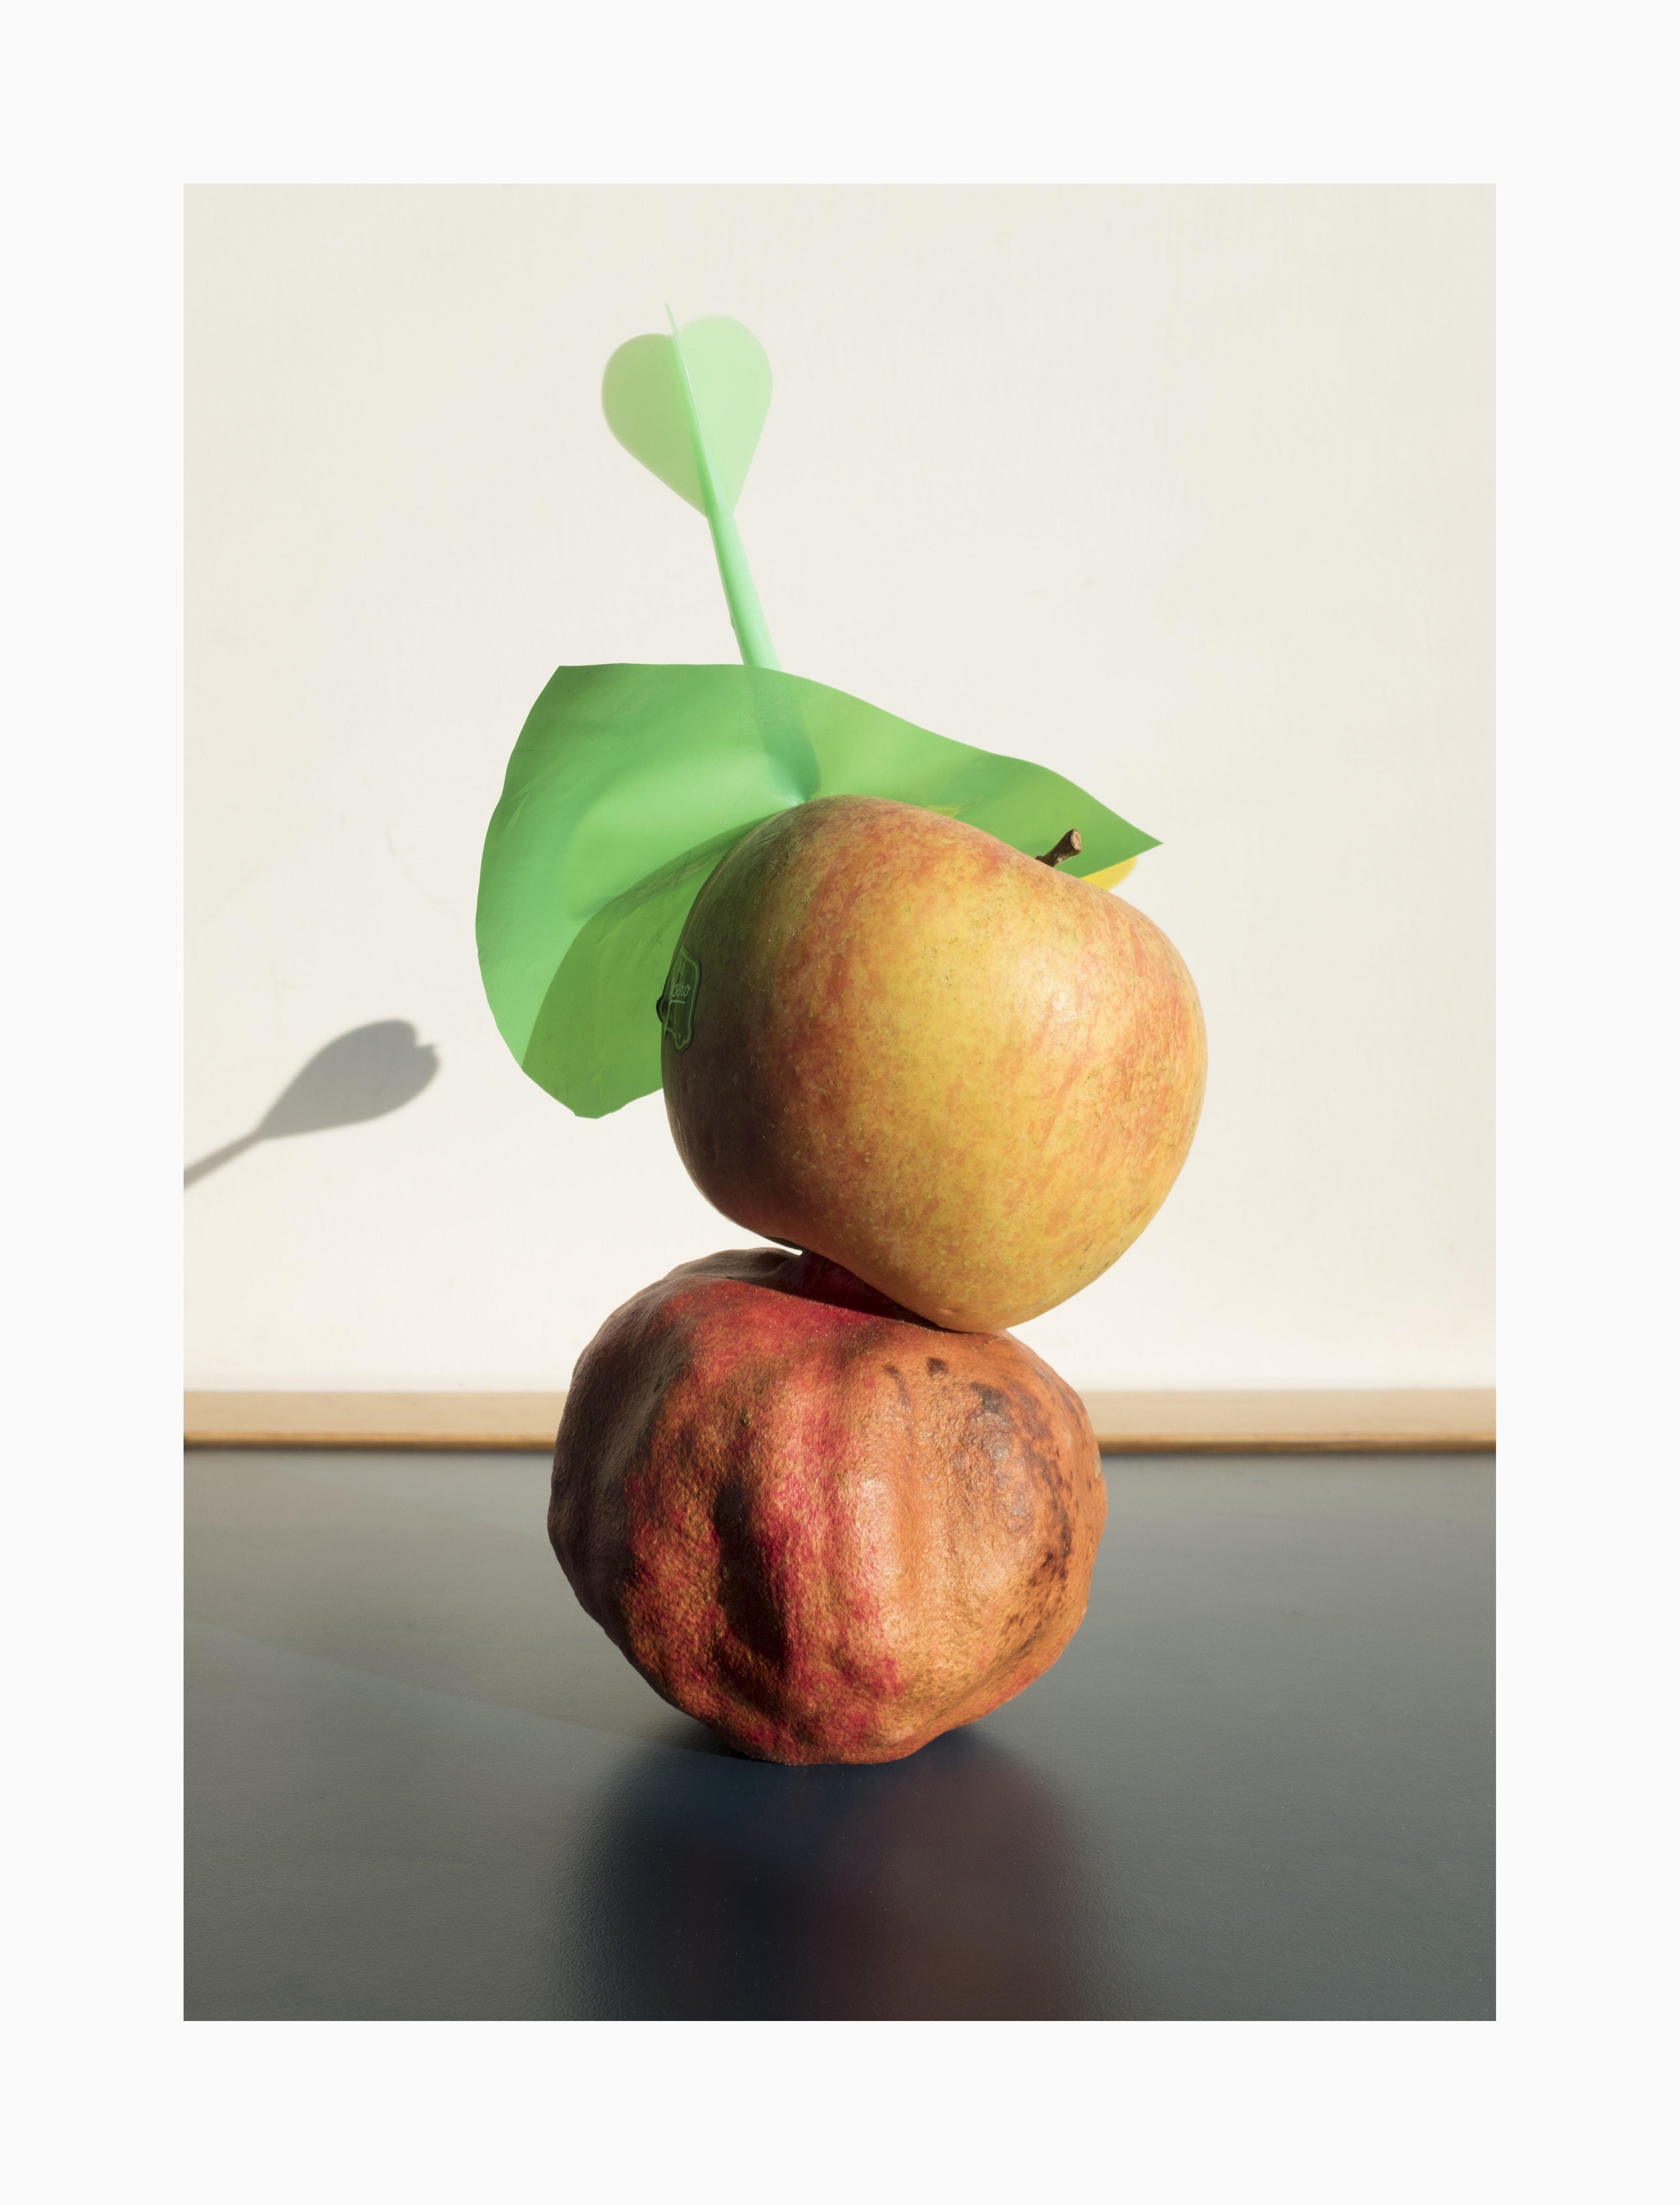 Jacopo Tomassini: Untitled from the Balance and Shape series (2018) © Jacopo Tomassini